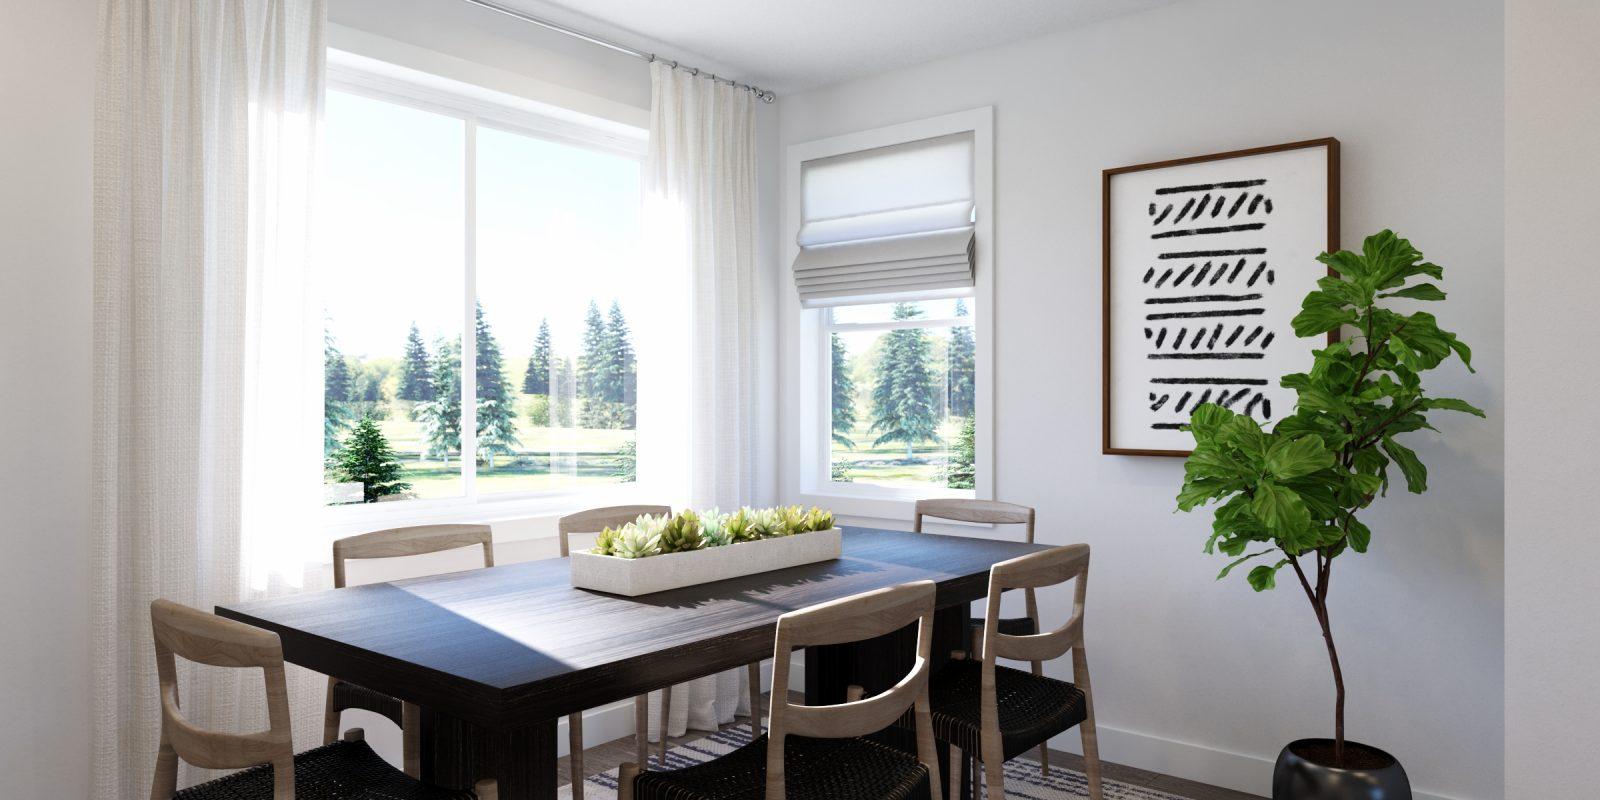 WestRidge DoMore Rows: Oasis - Dining Room